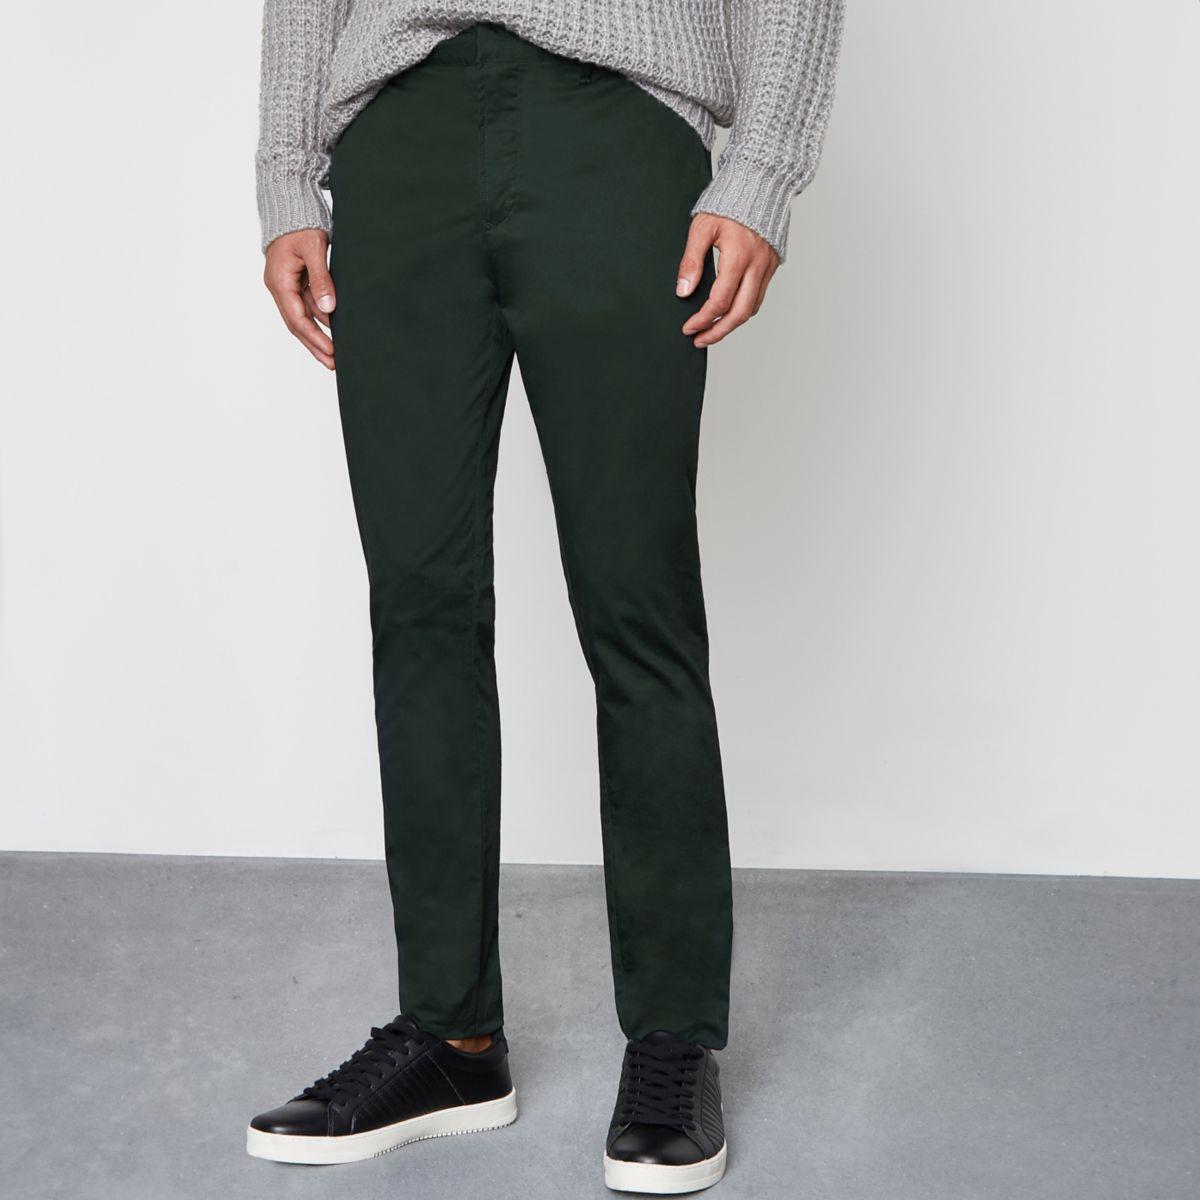 Green skinny chino pants